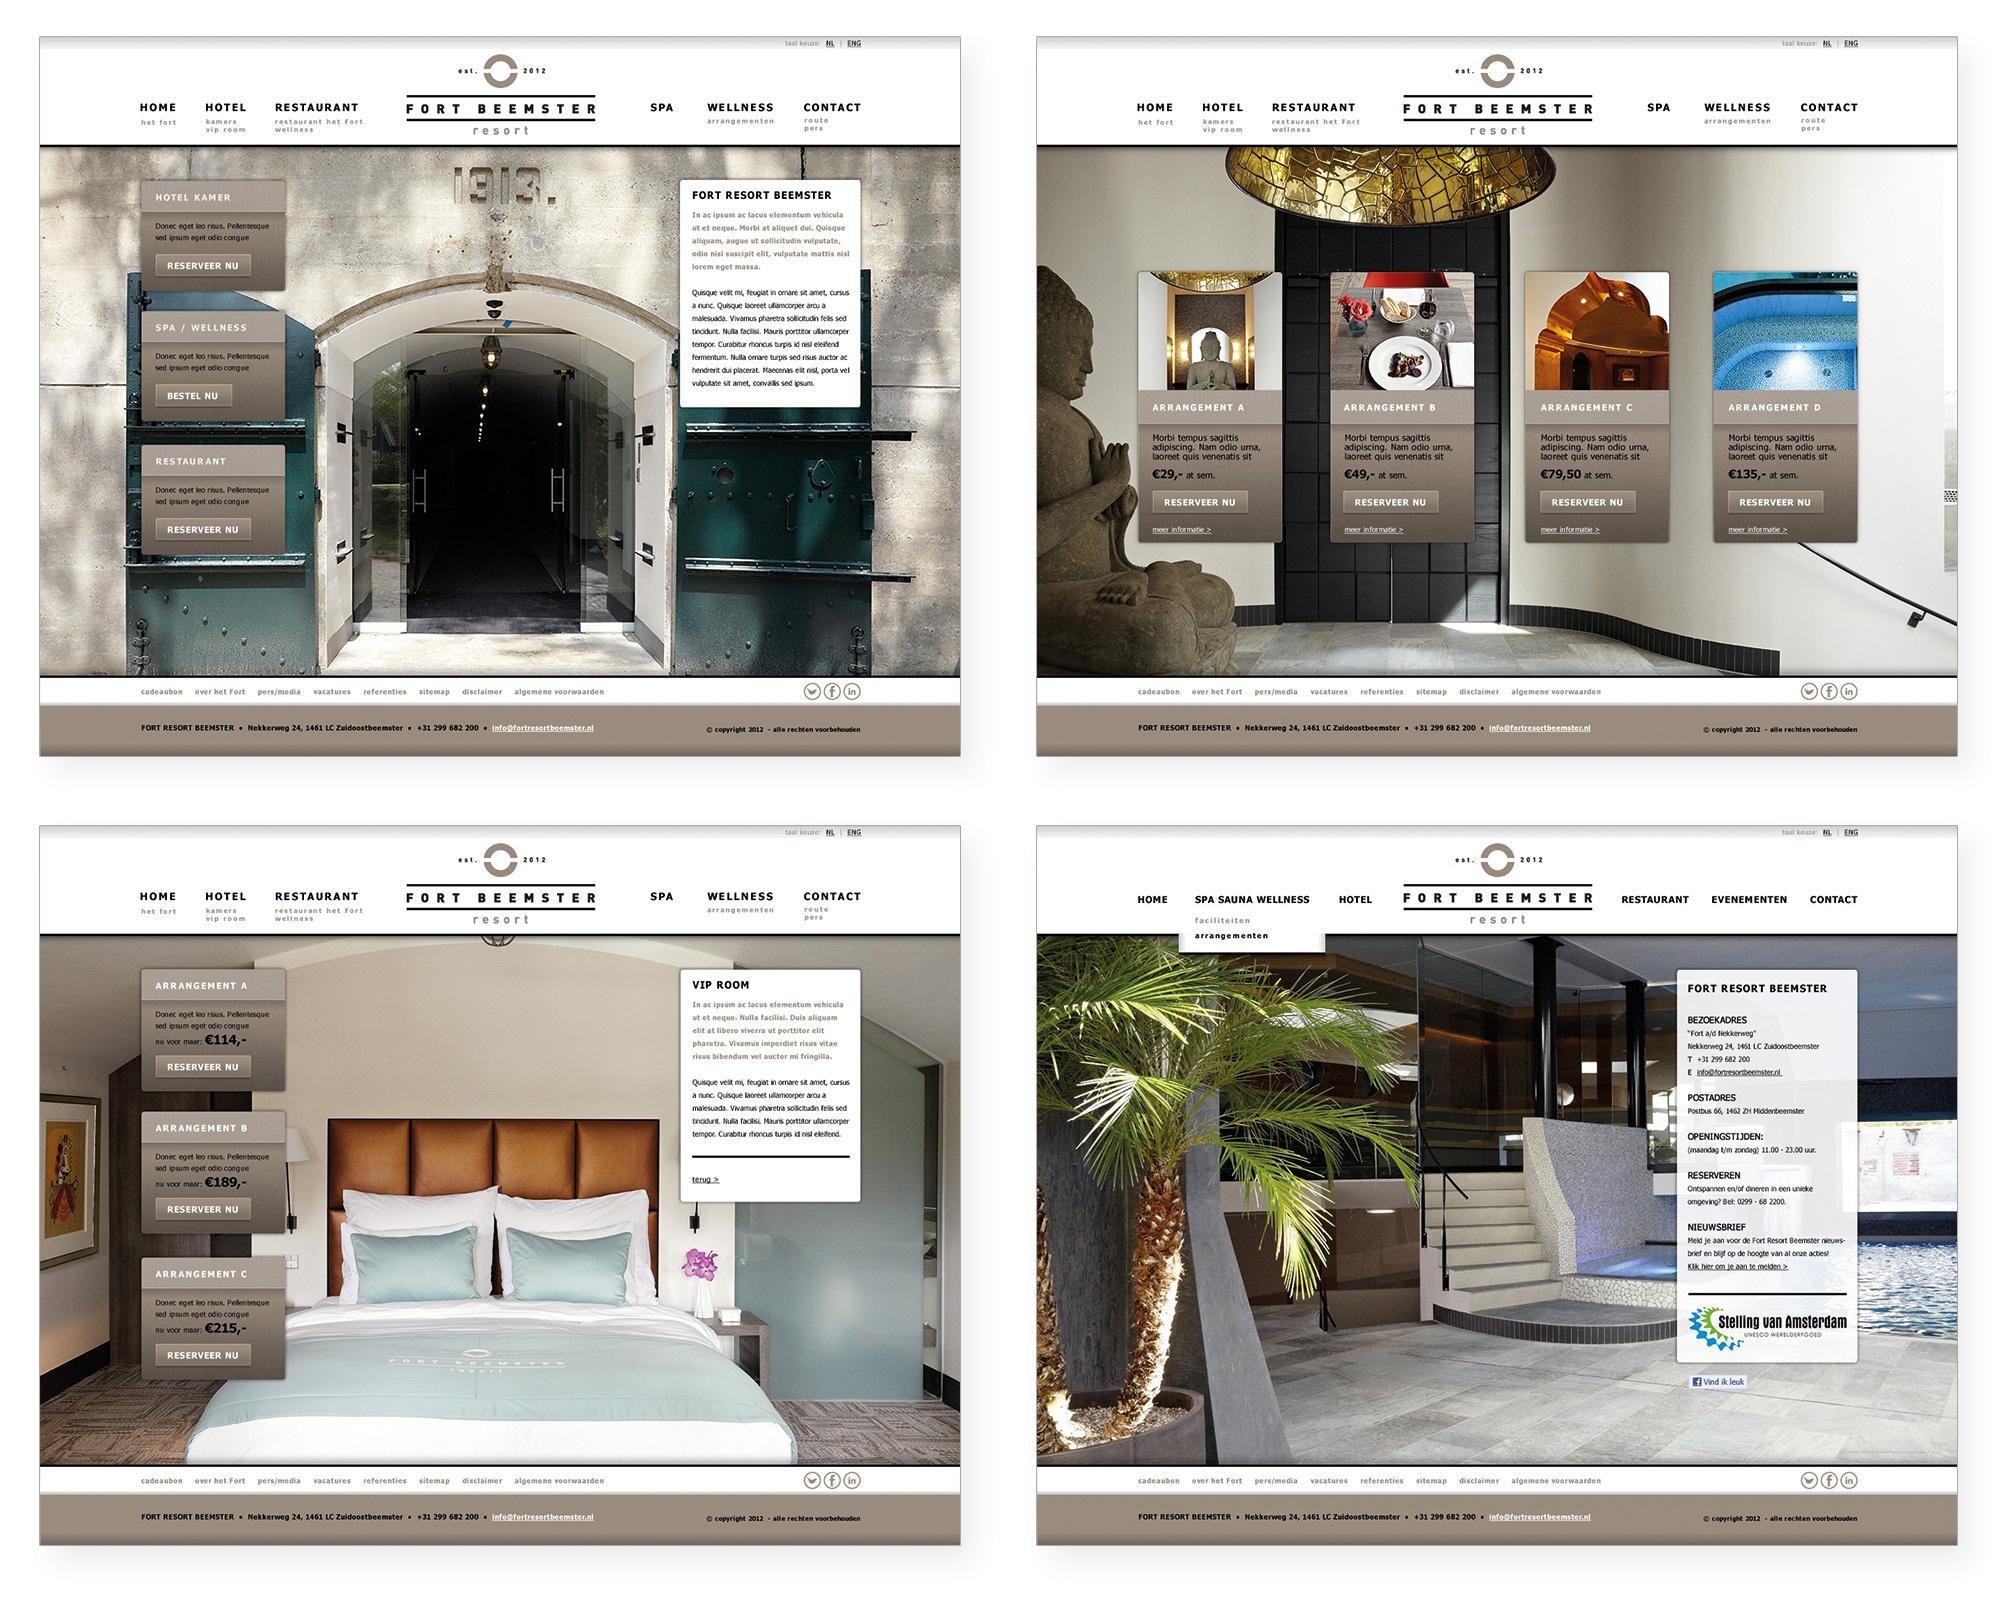 Fort Resort Beemster - website - initial design